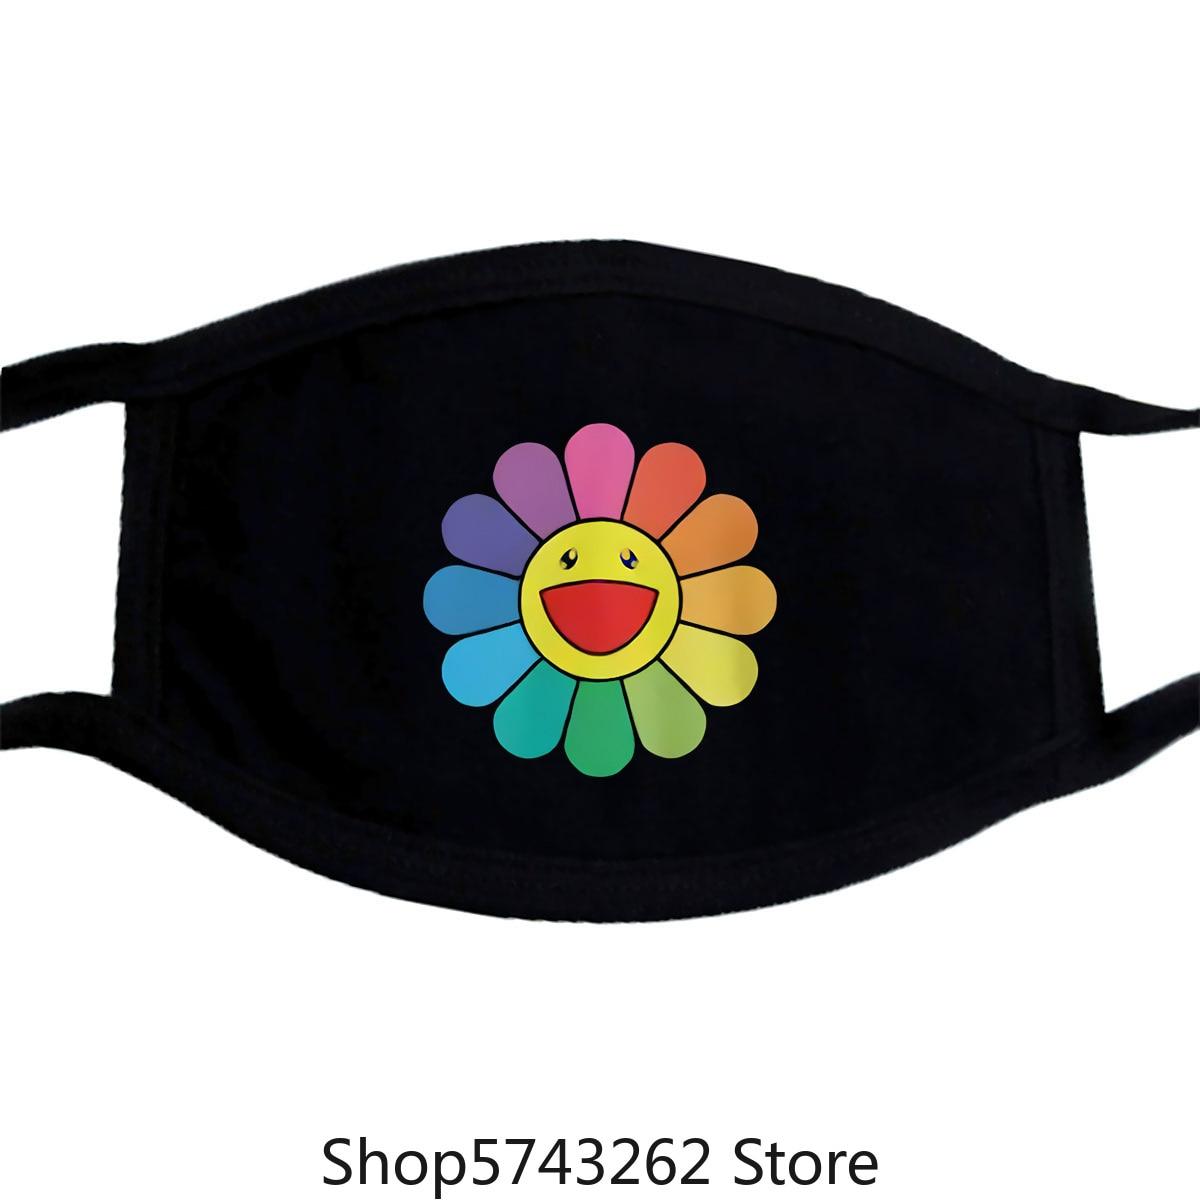 Takashi Murakami Happy Flower Mask Unisex Murakami Mask For Men And Women Washable Reusable Mask With